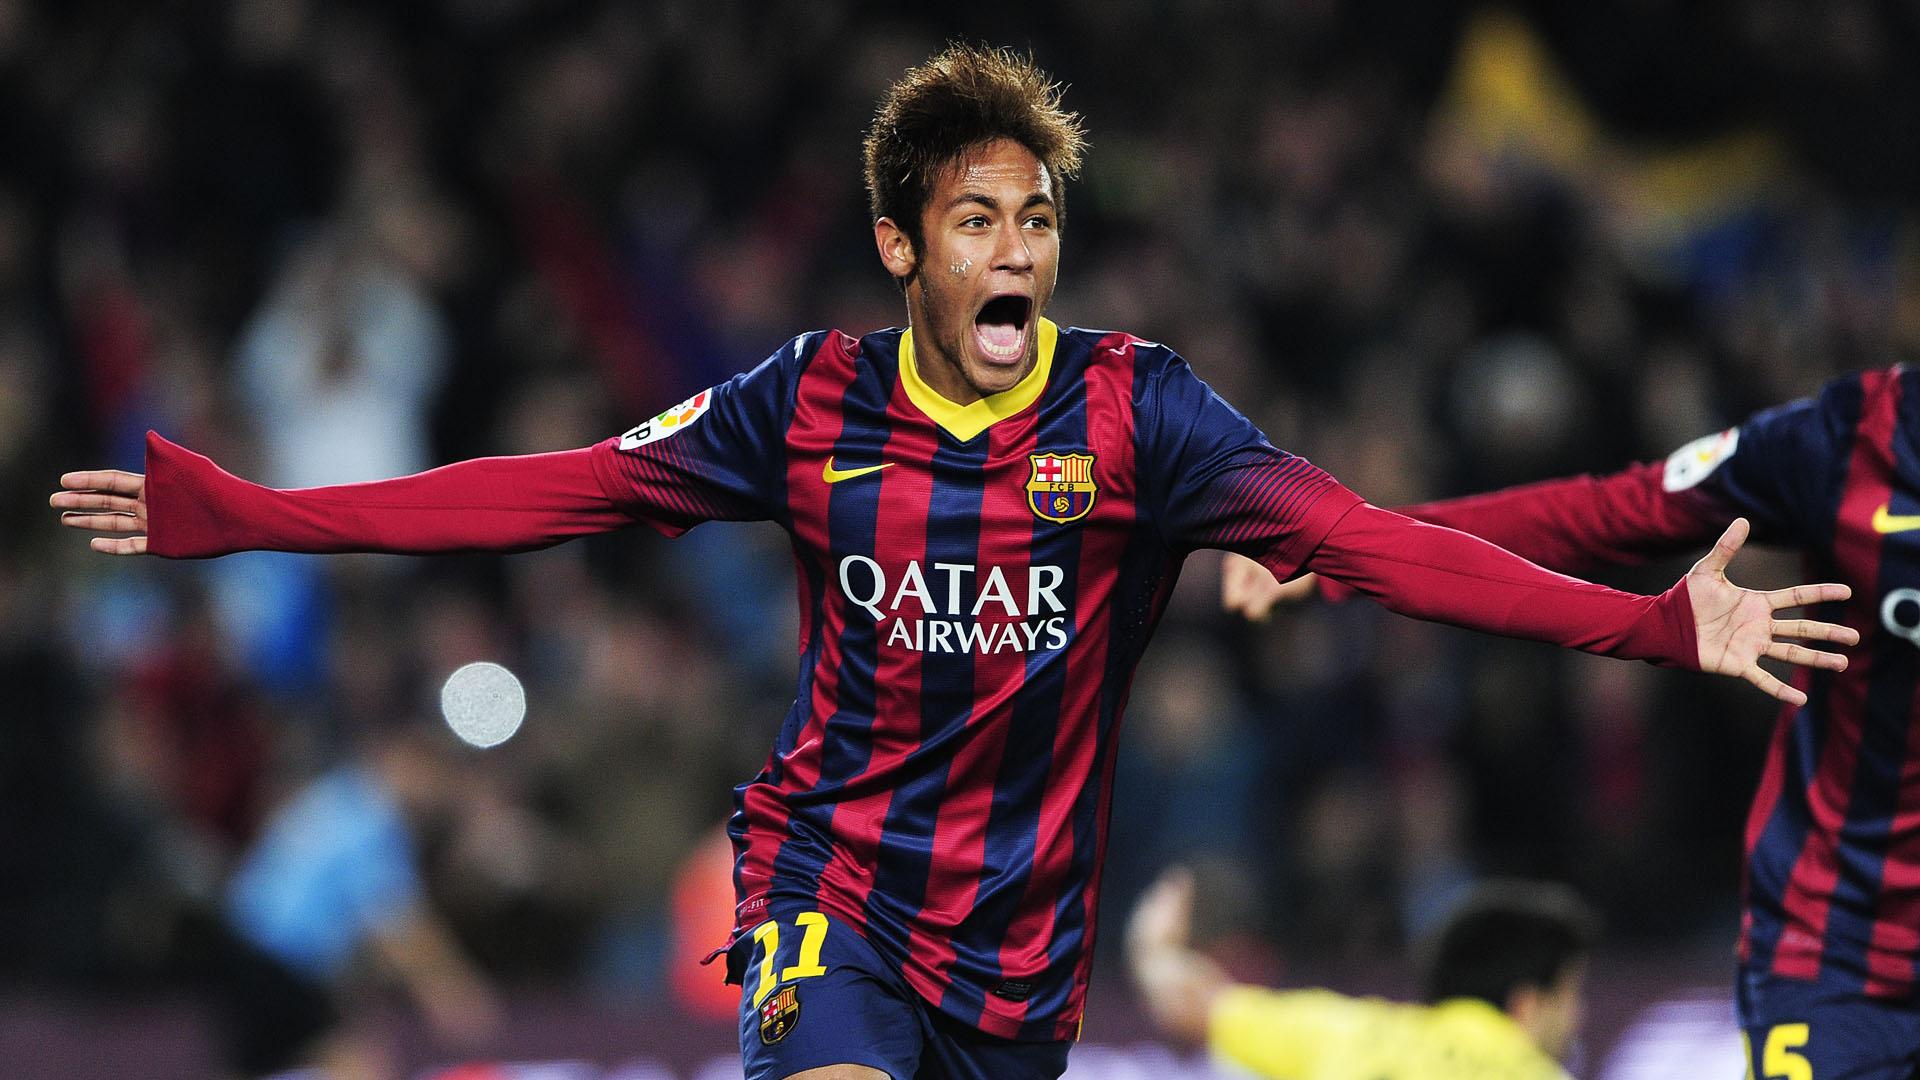 Neymar Wallpaper HD Download - Neymar Wallpaper HD 1.1 (Android ...